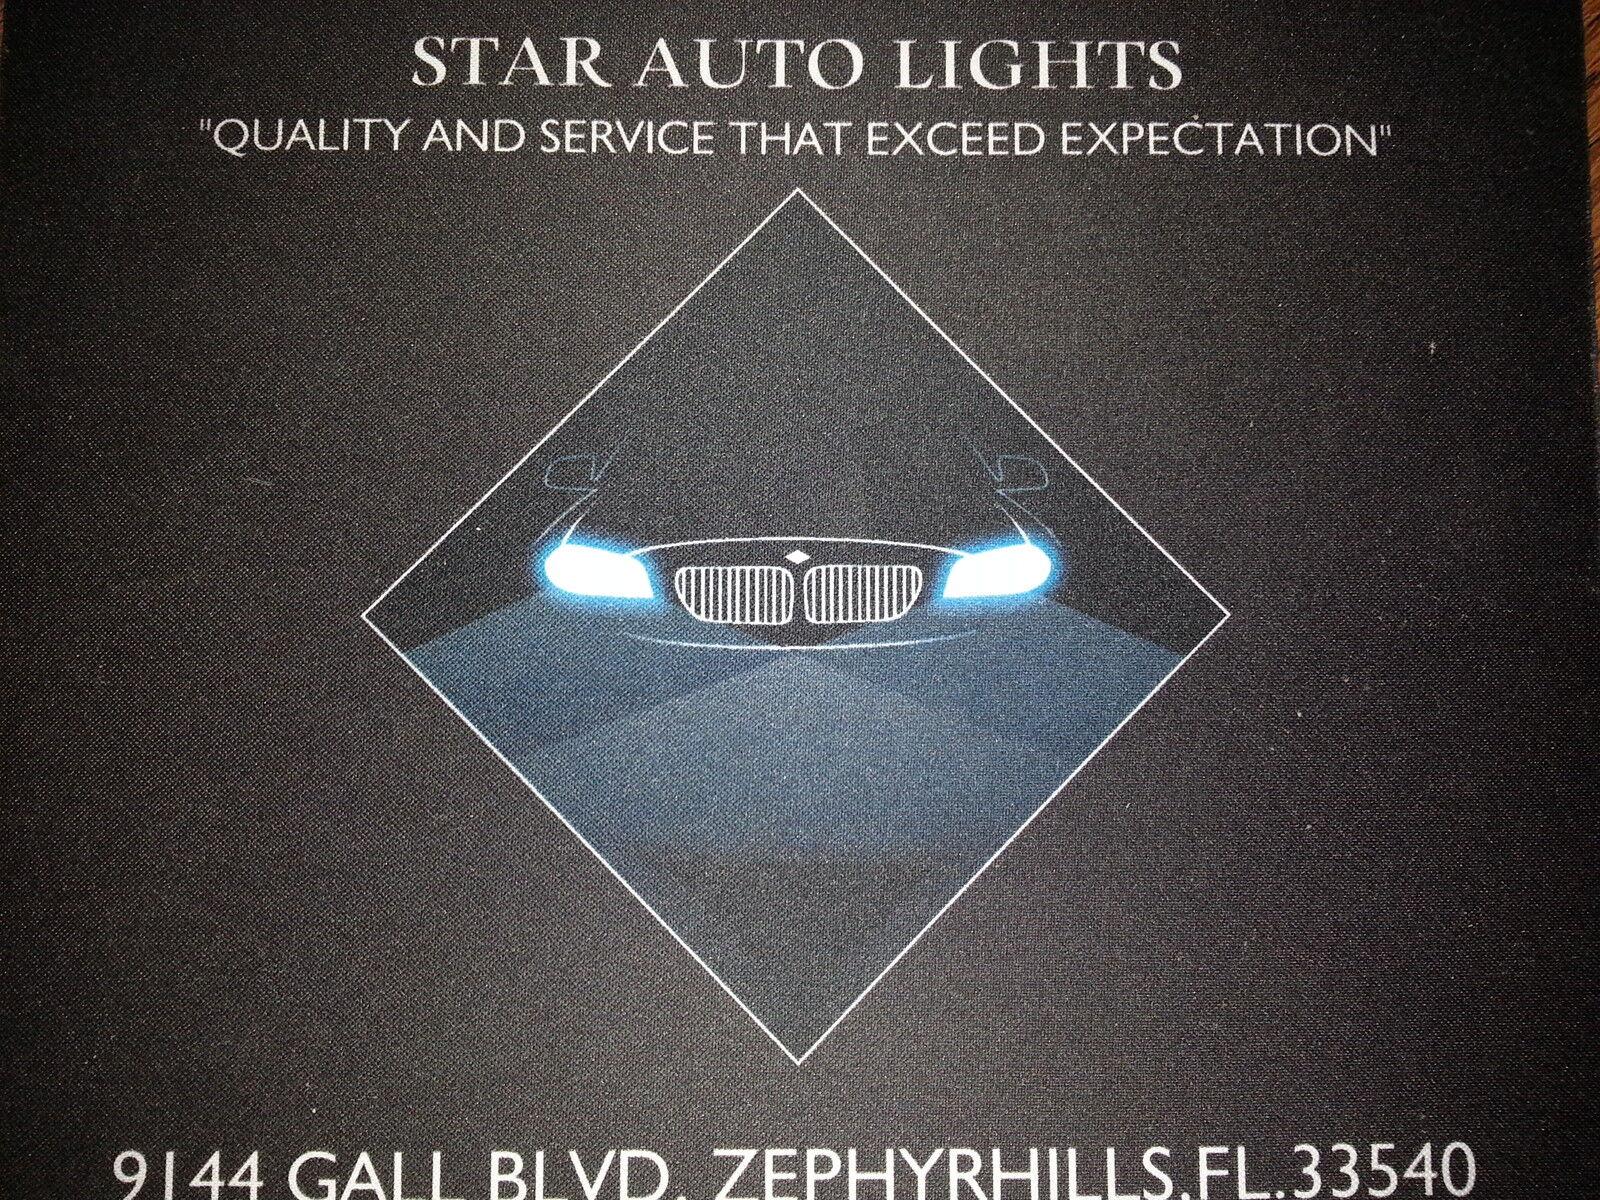 STAR AUTO LIGHTS